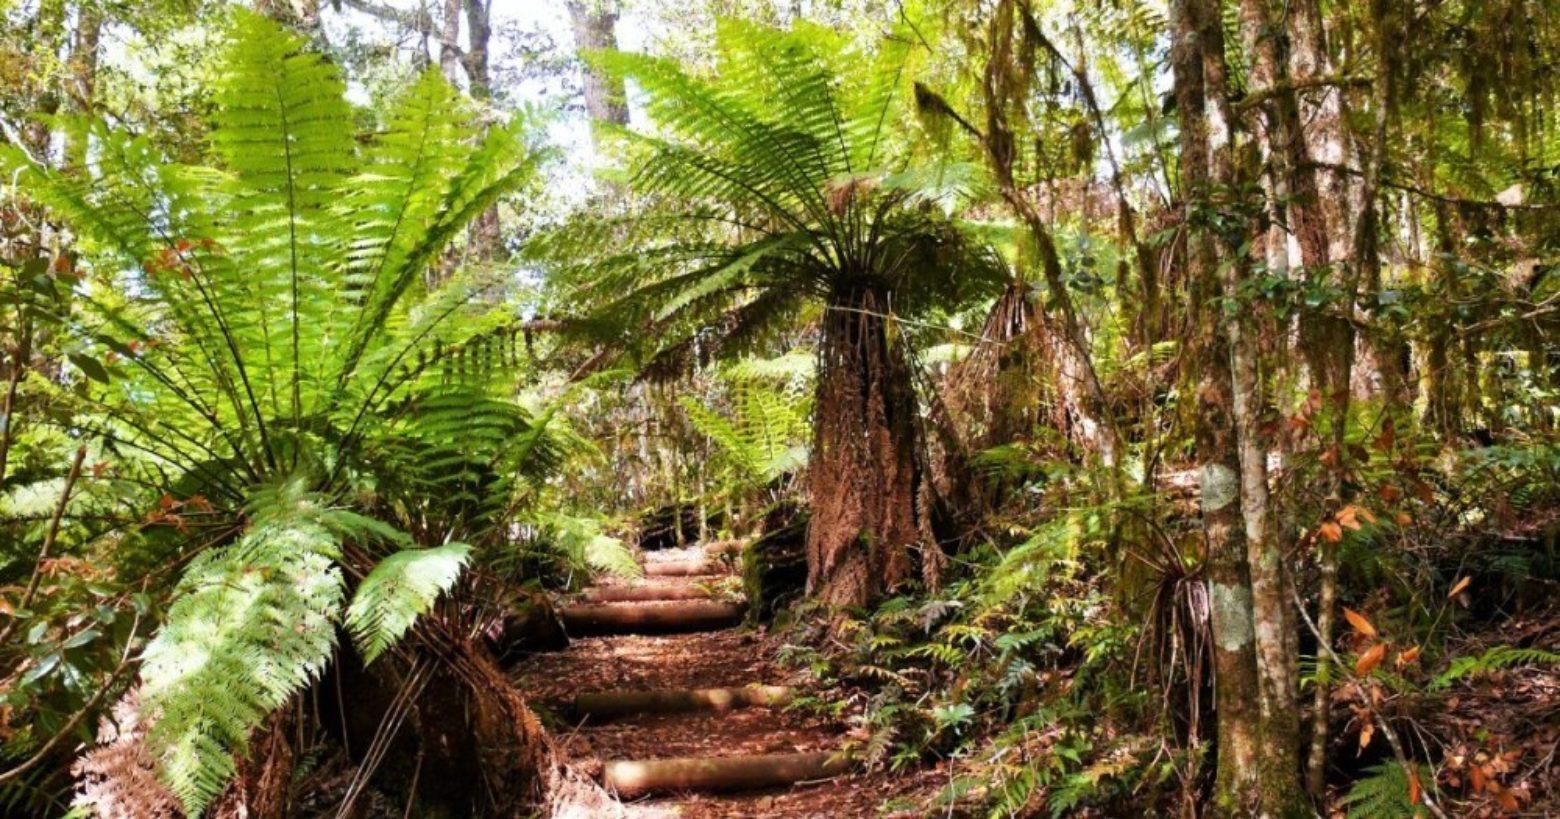 Tree ferns on Honeysuckle Forest Walk in Barrington Tops